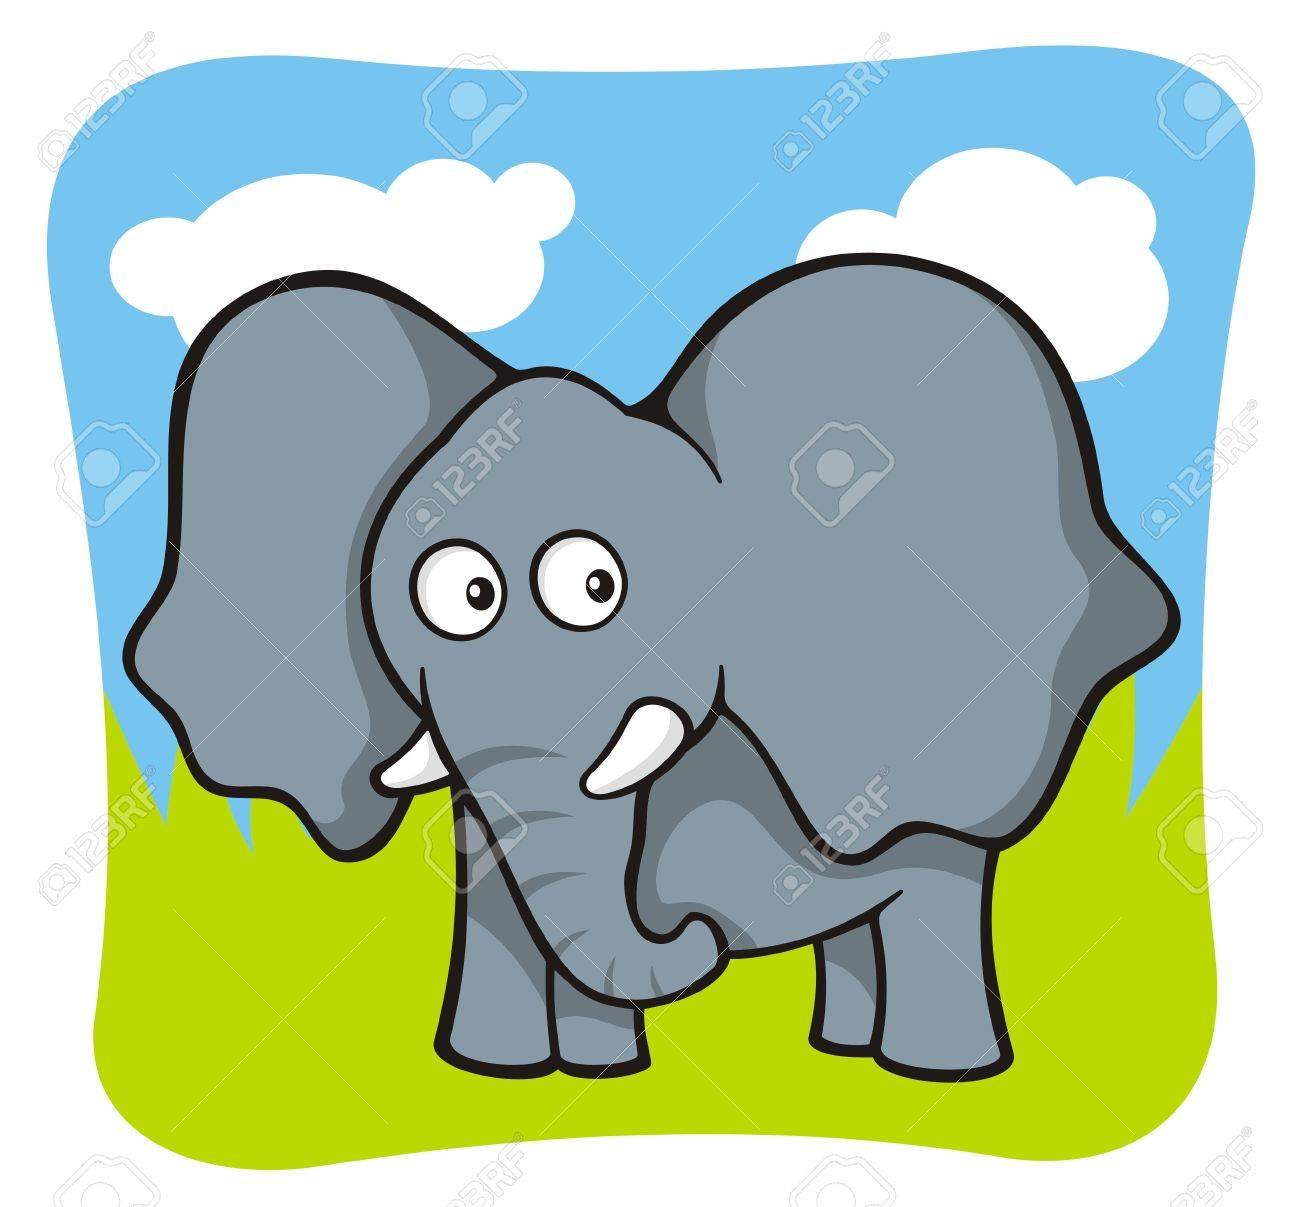 Cute baby elephant cartoon on sky and grass background - 7309038